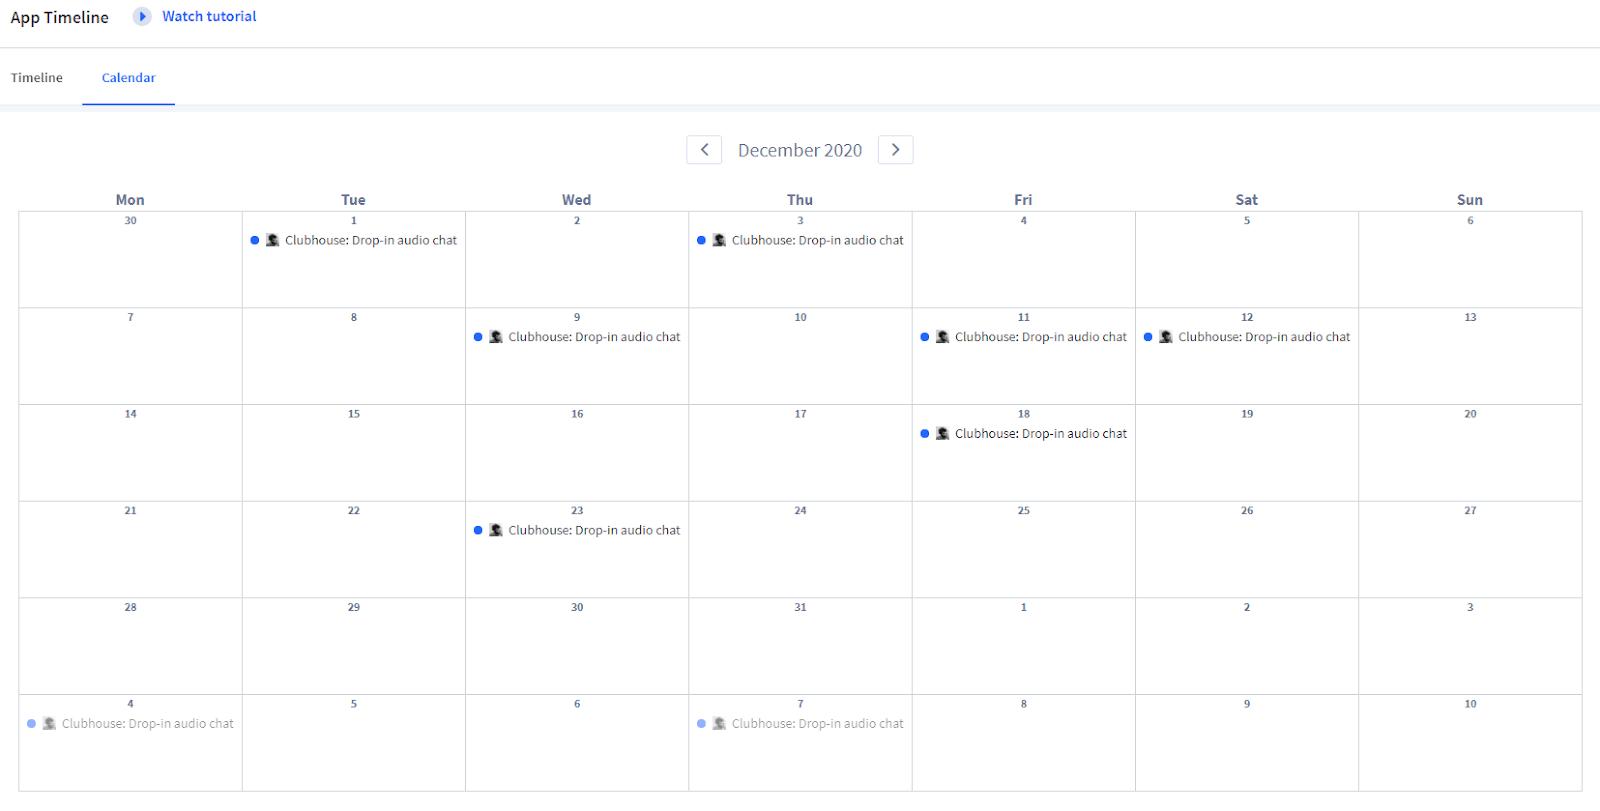 Clubhouse App Store Update Calendar